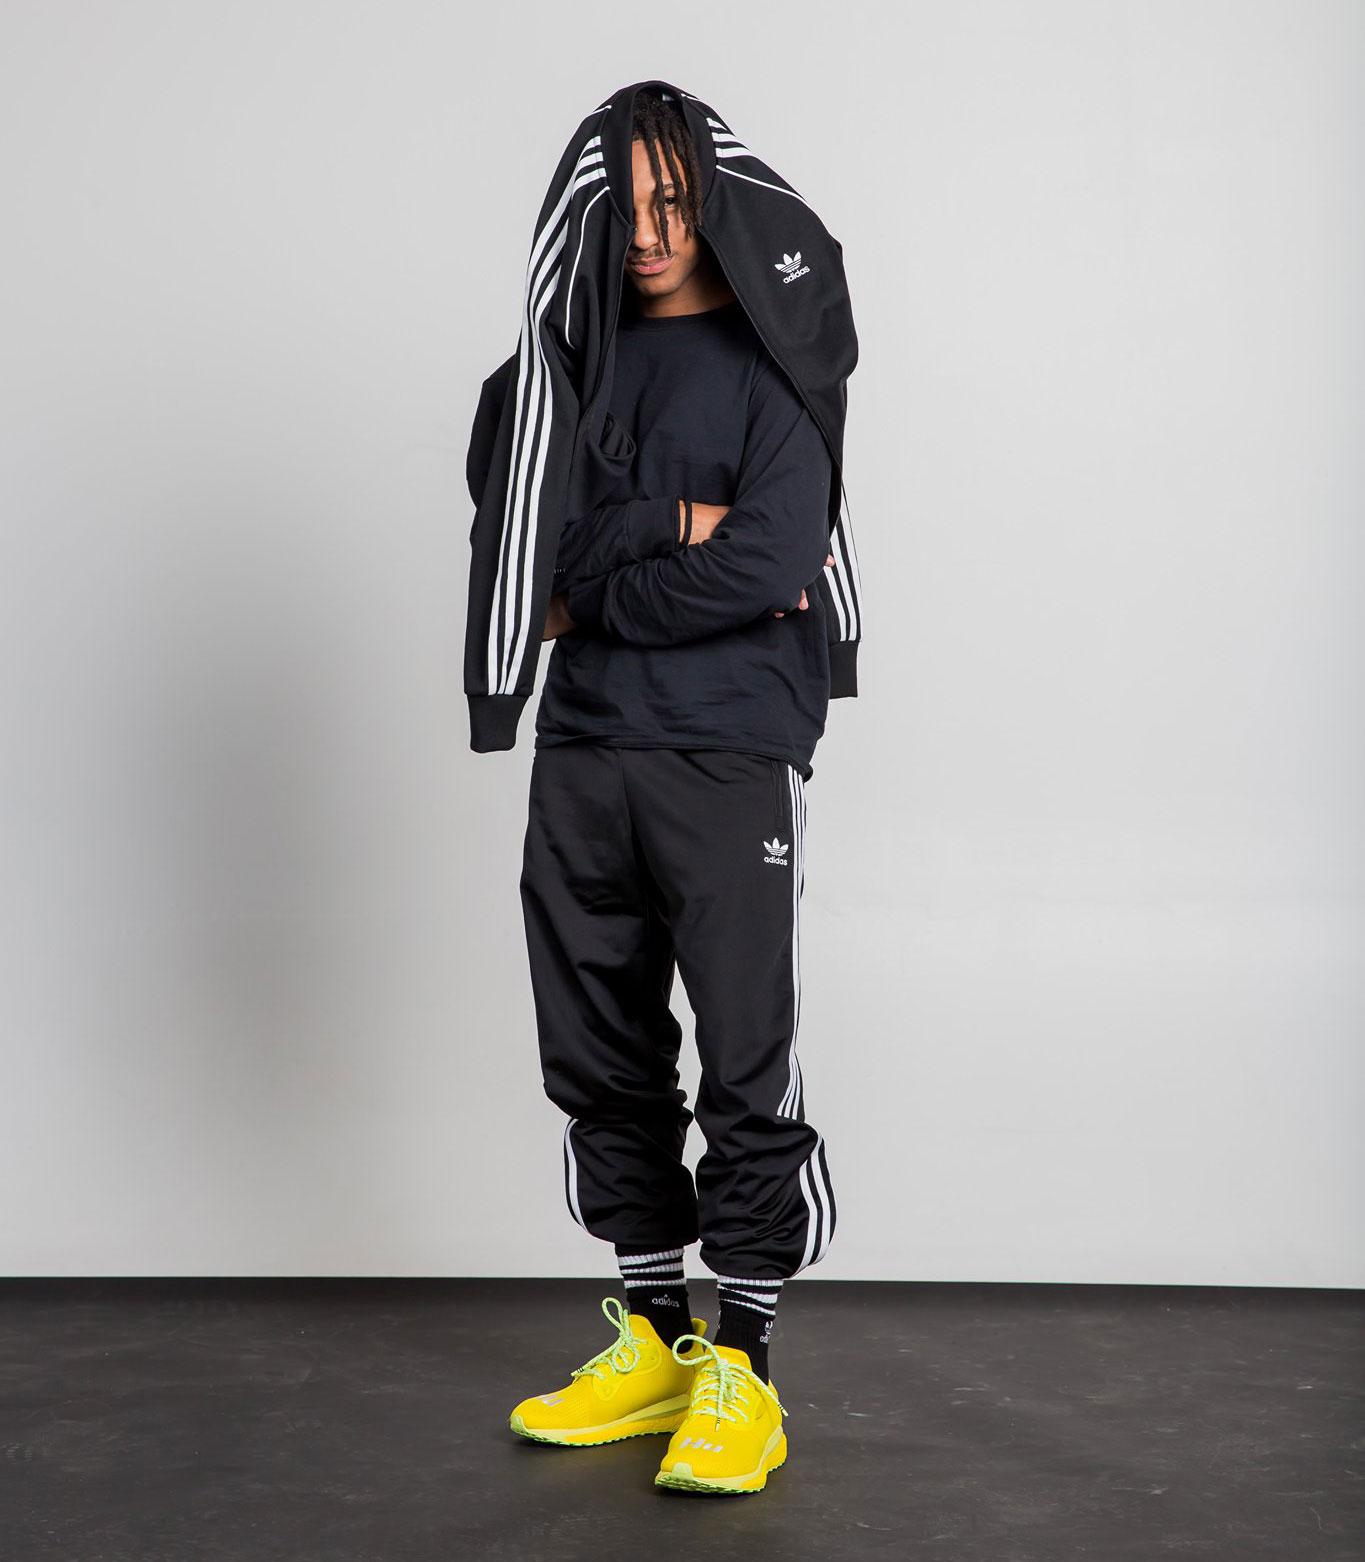 adidas-originals-pharrell-human-race-shoes-clothing-3